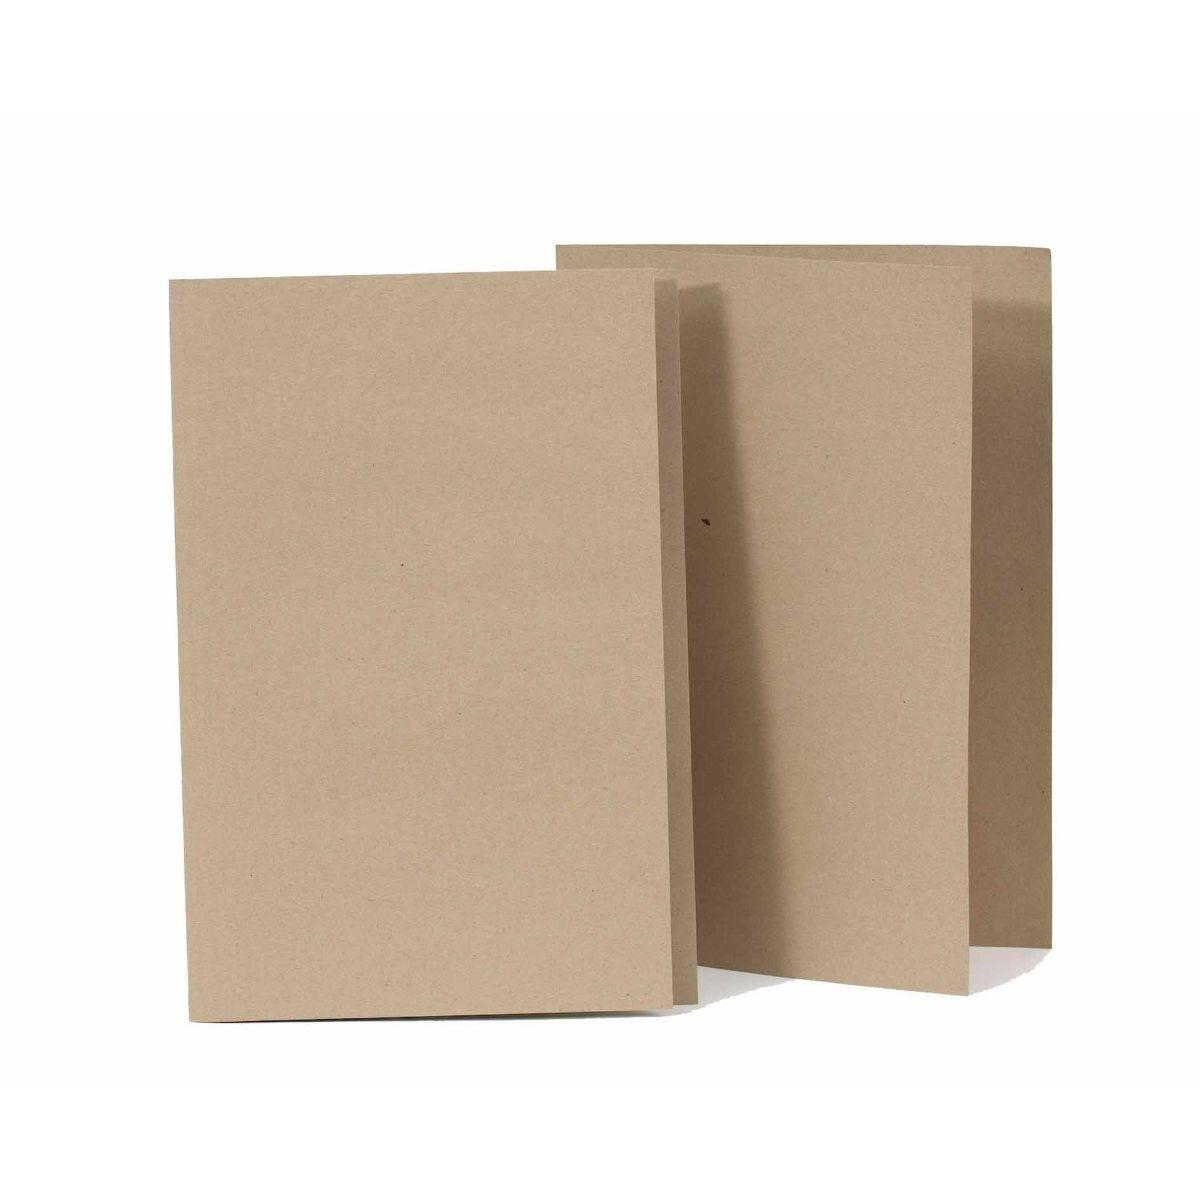 Exacompta Kraft Liner Foolscap Folder Pack of 100 170gsm Buff